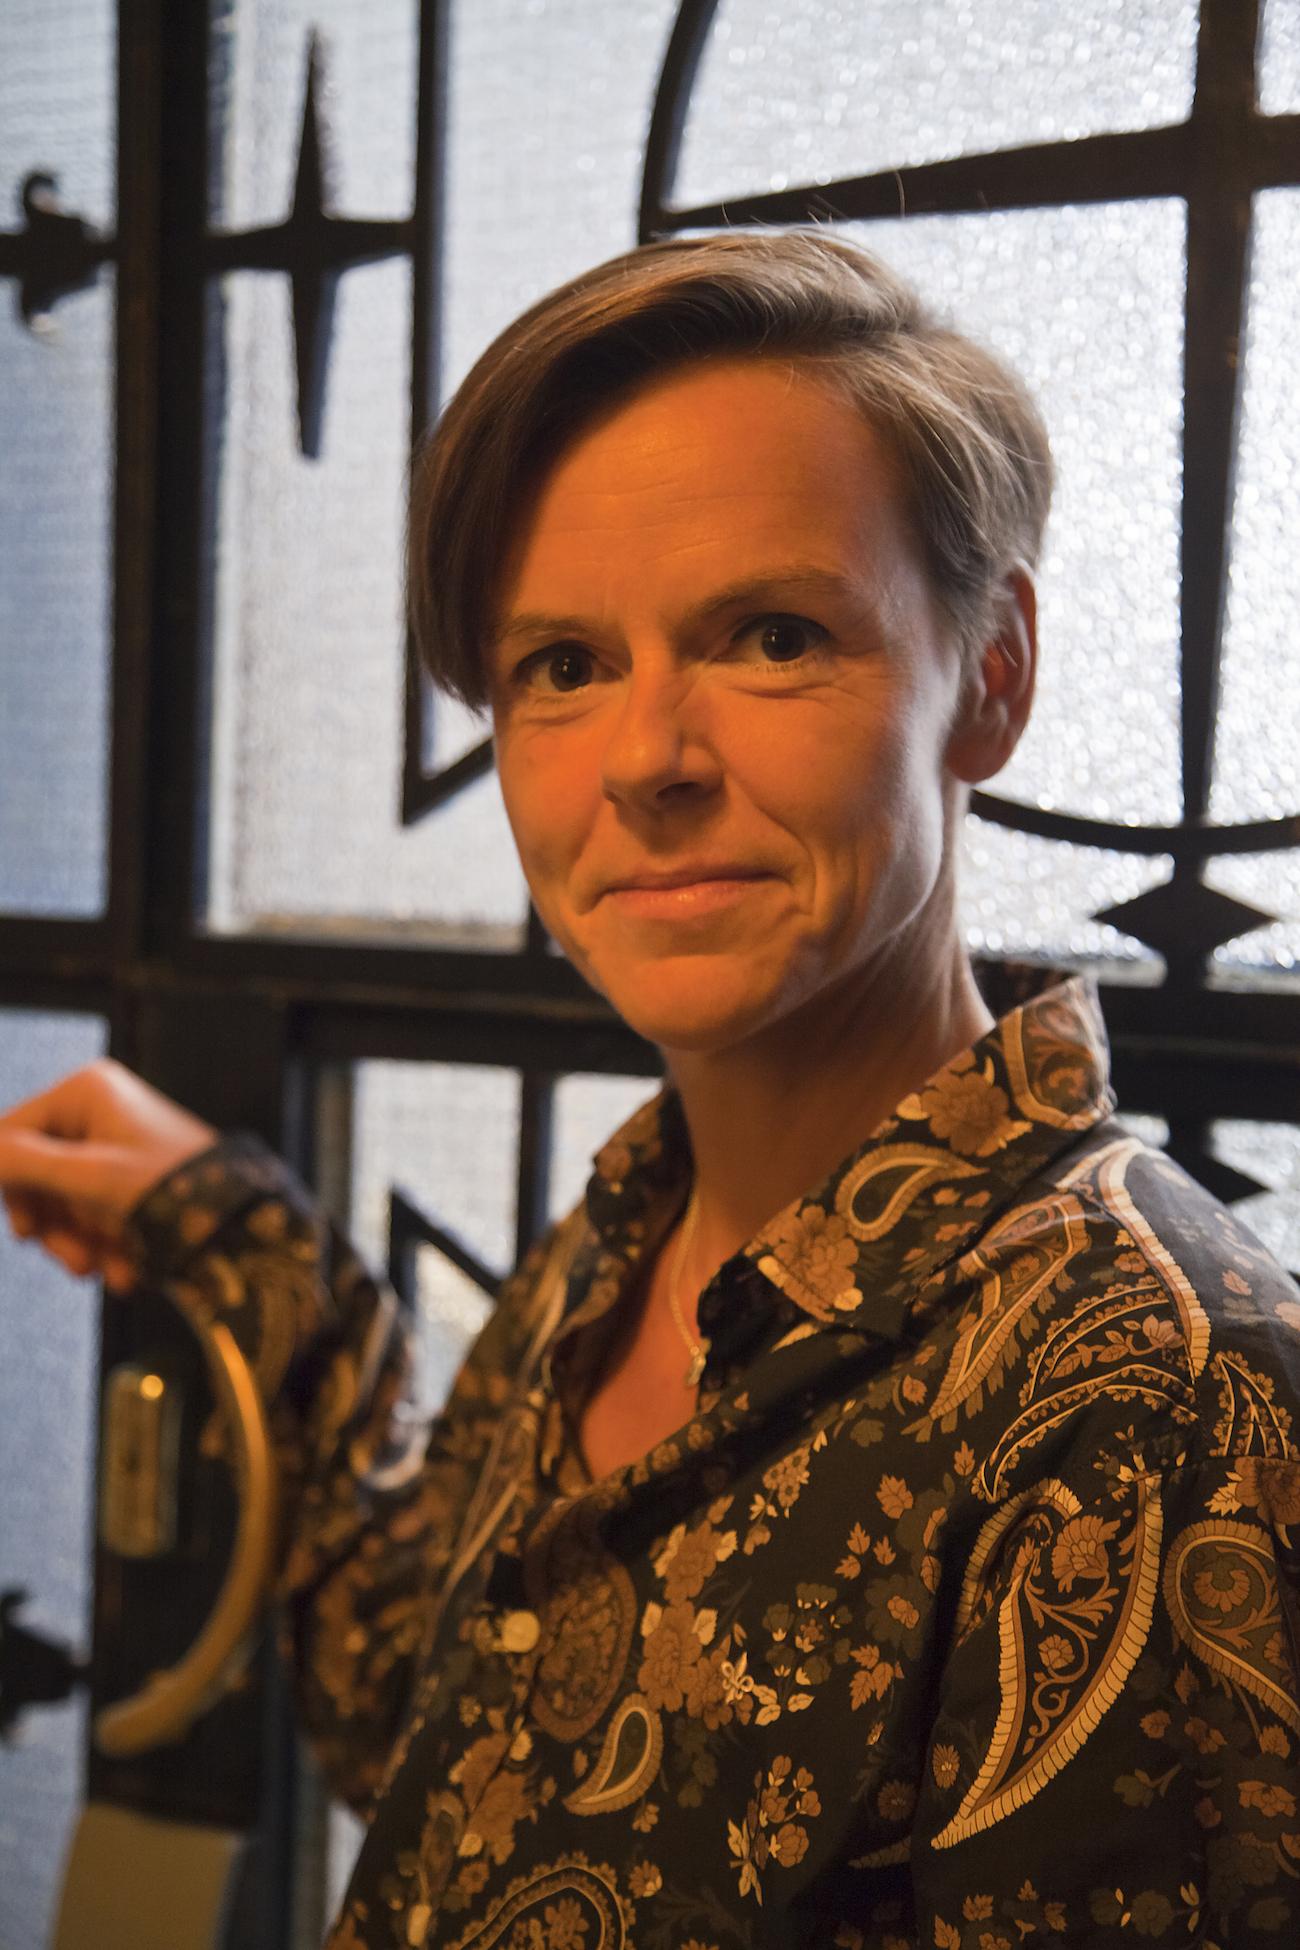 Kirjailija Antje Rávik Strubel Hotelli Tammerissa.